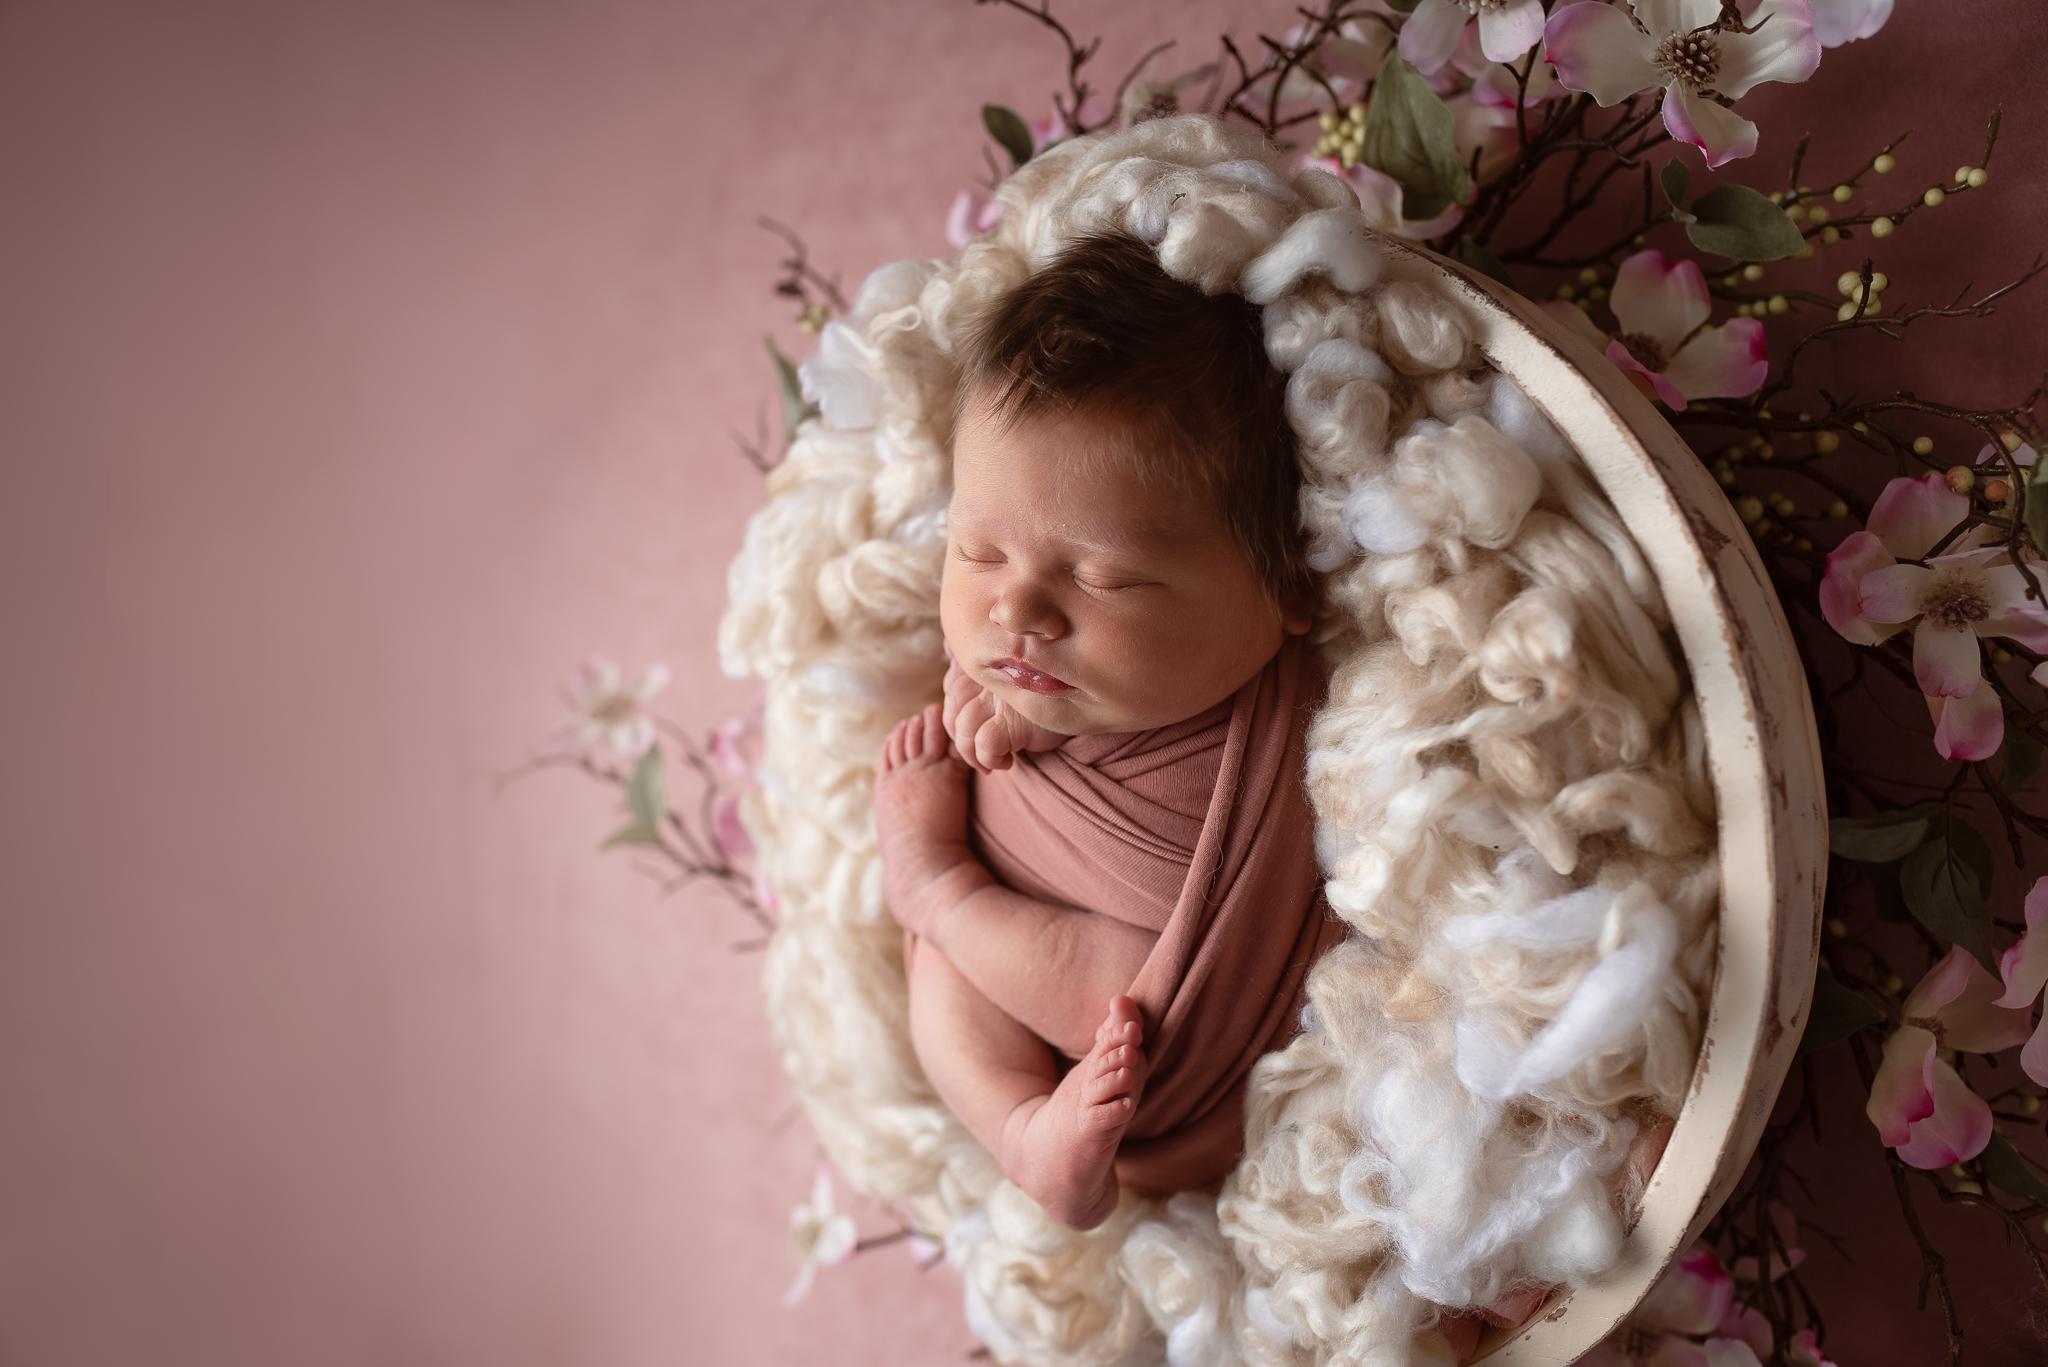 Newborn164NaomiLuciennePhotography062019-2-Edit.jpg